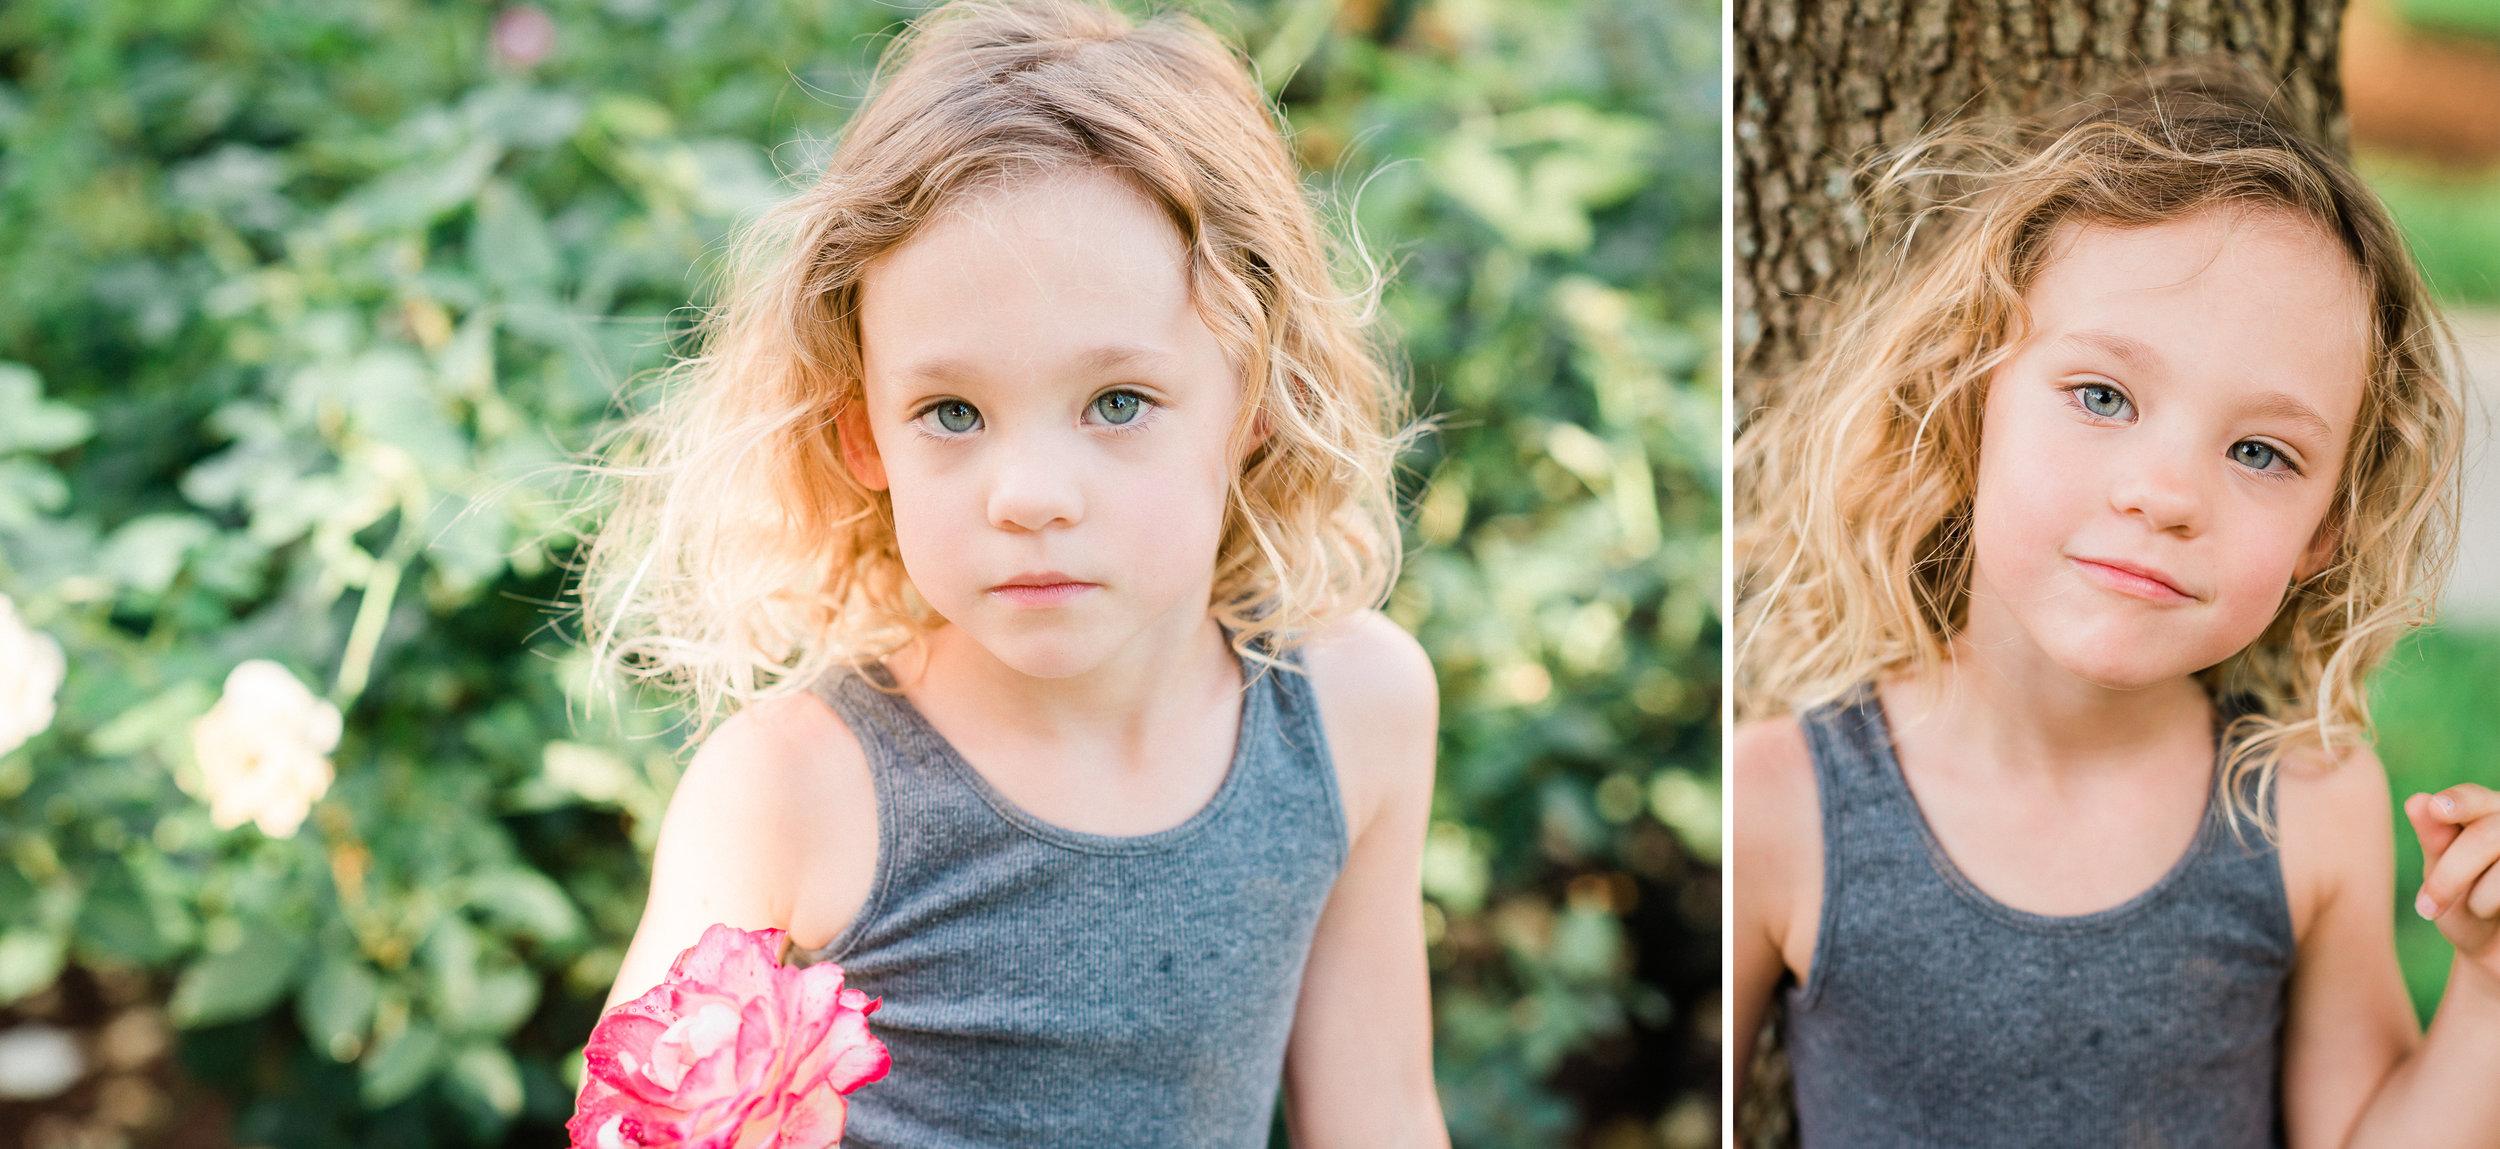 KateTaramykinStudios-Winter-Park-Family-Portraits-CA-8.jpg